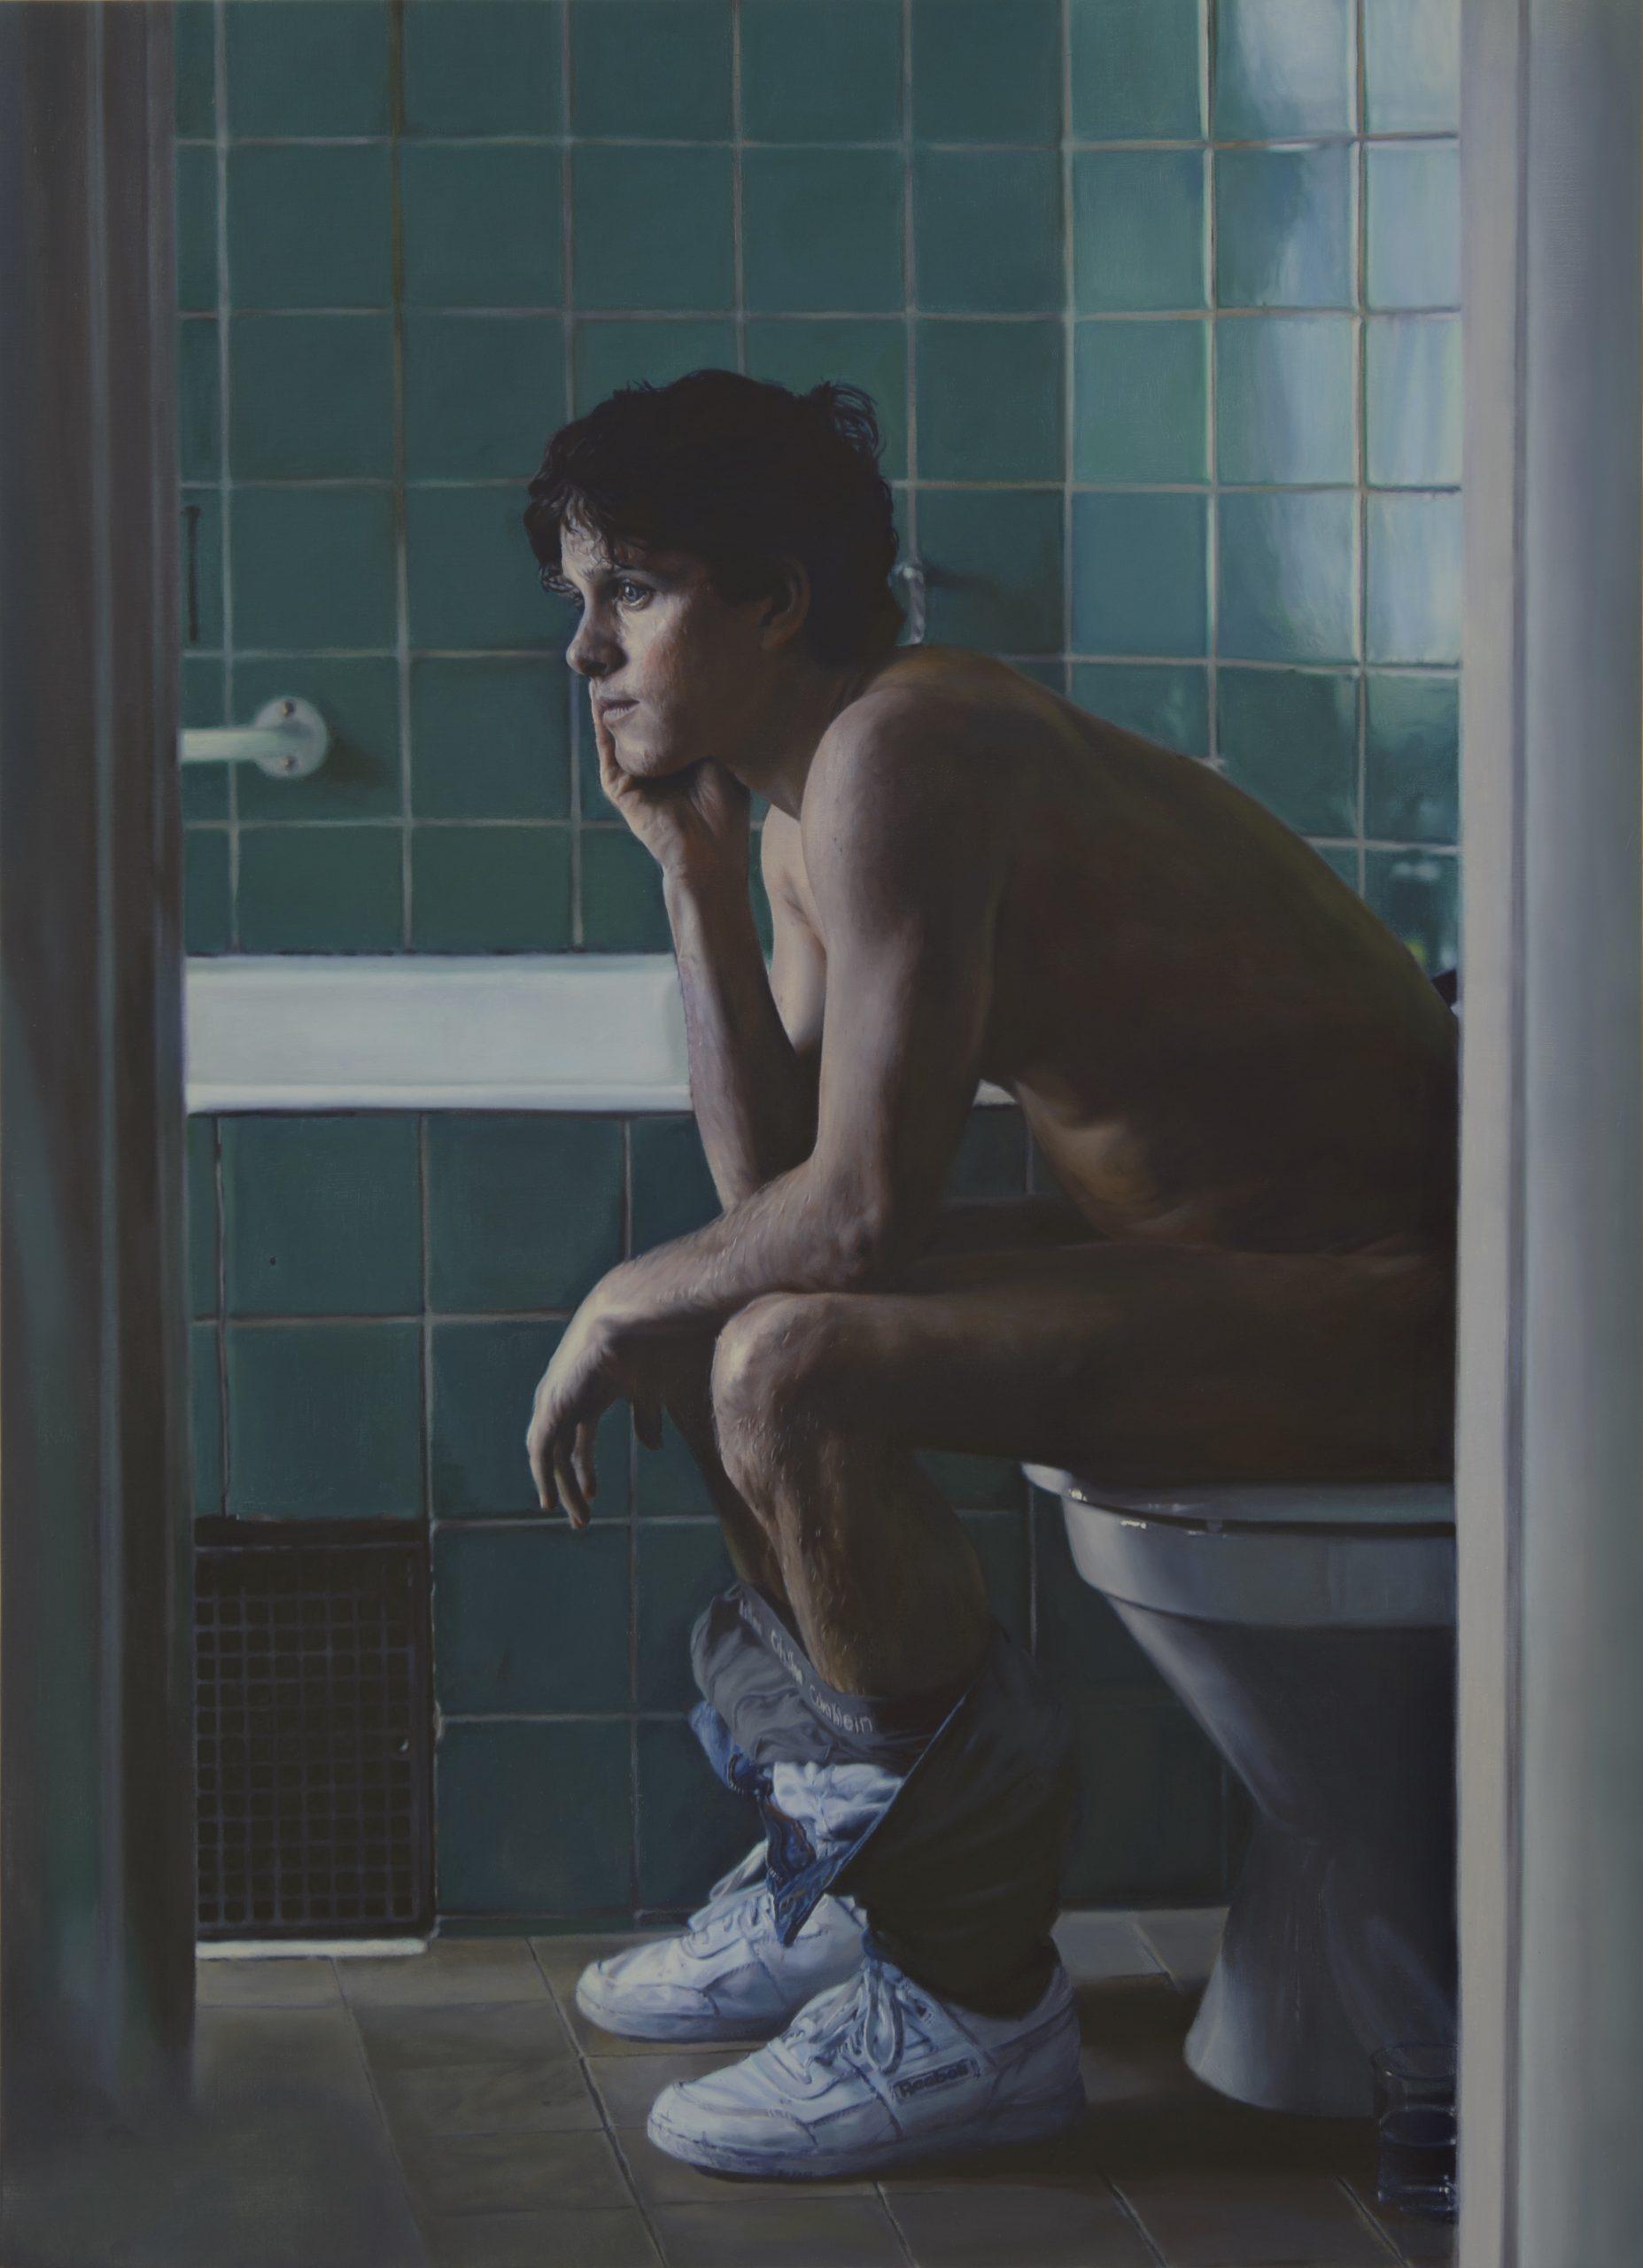 "Niklas Holmgren, ""Adam i badrummet"", 2018. Oil on canvas, 109 x 79 cm,"